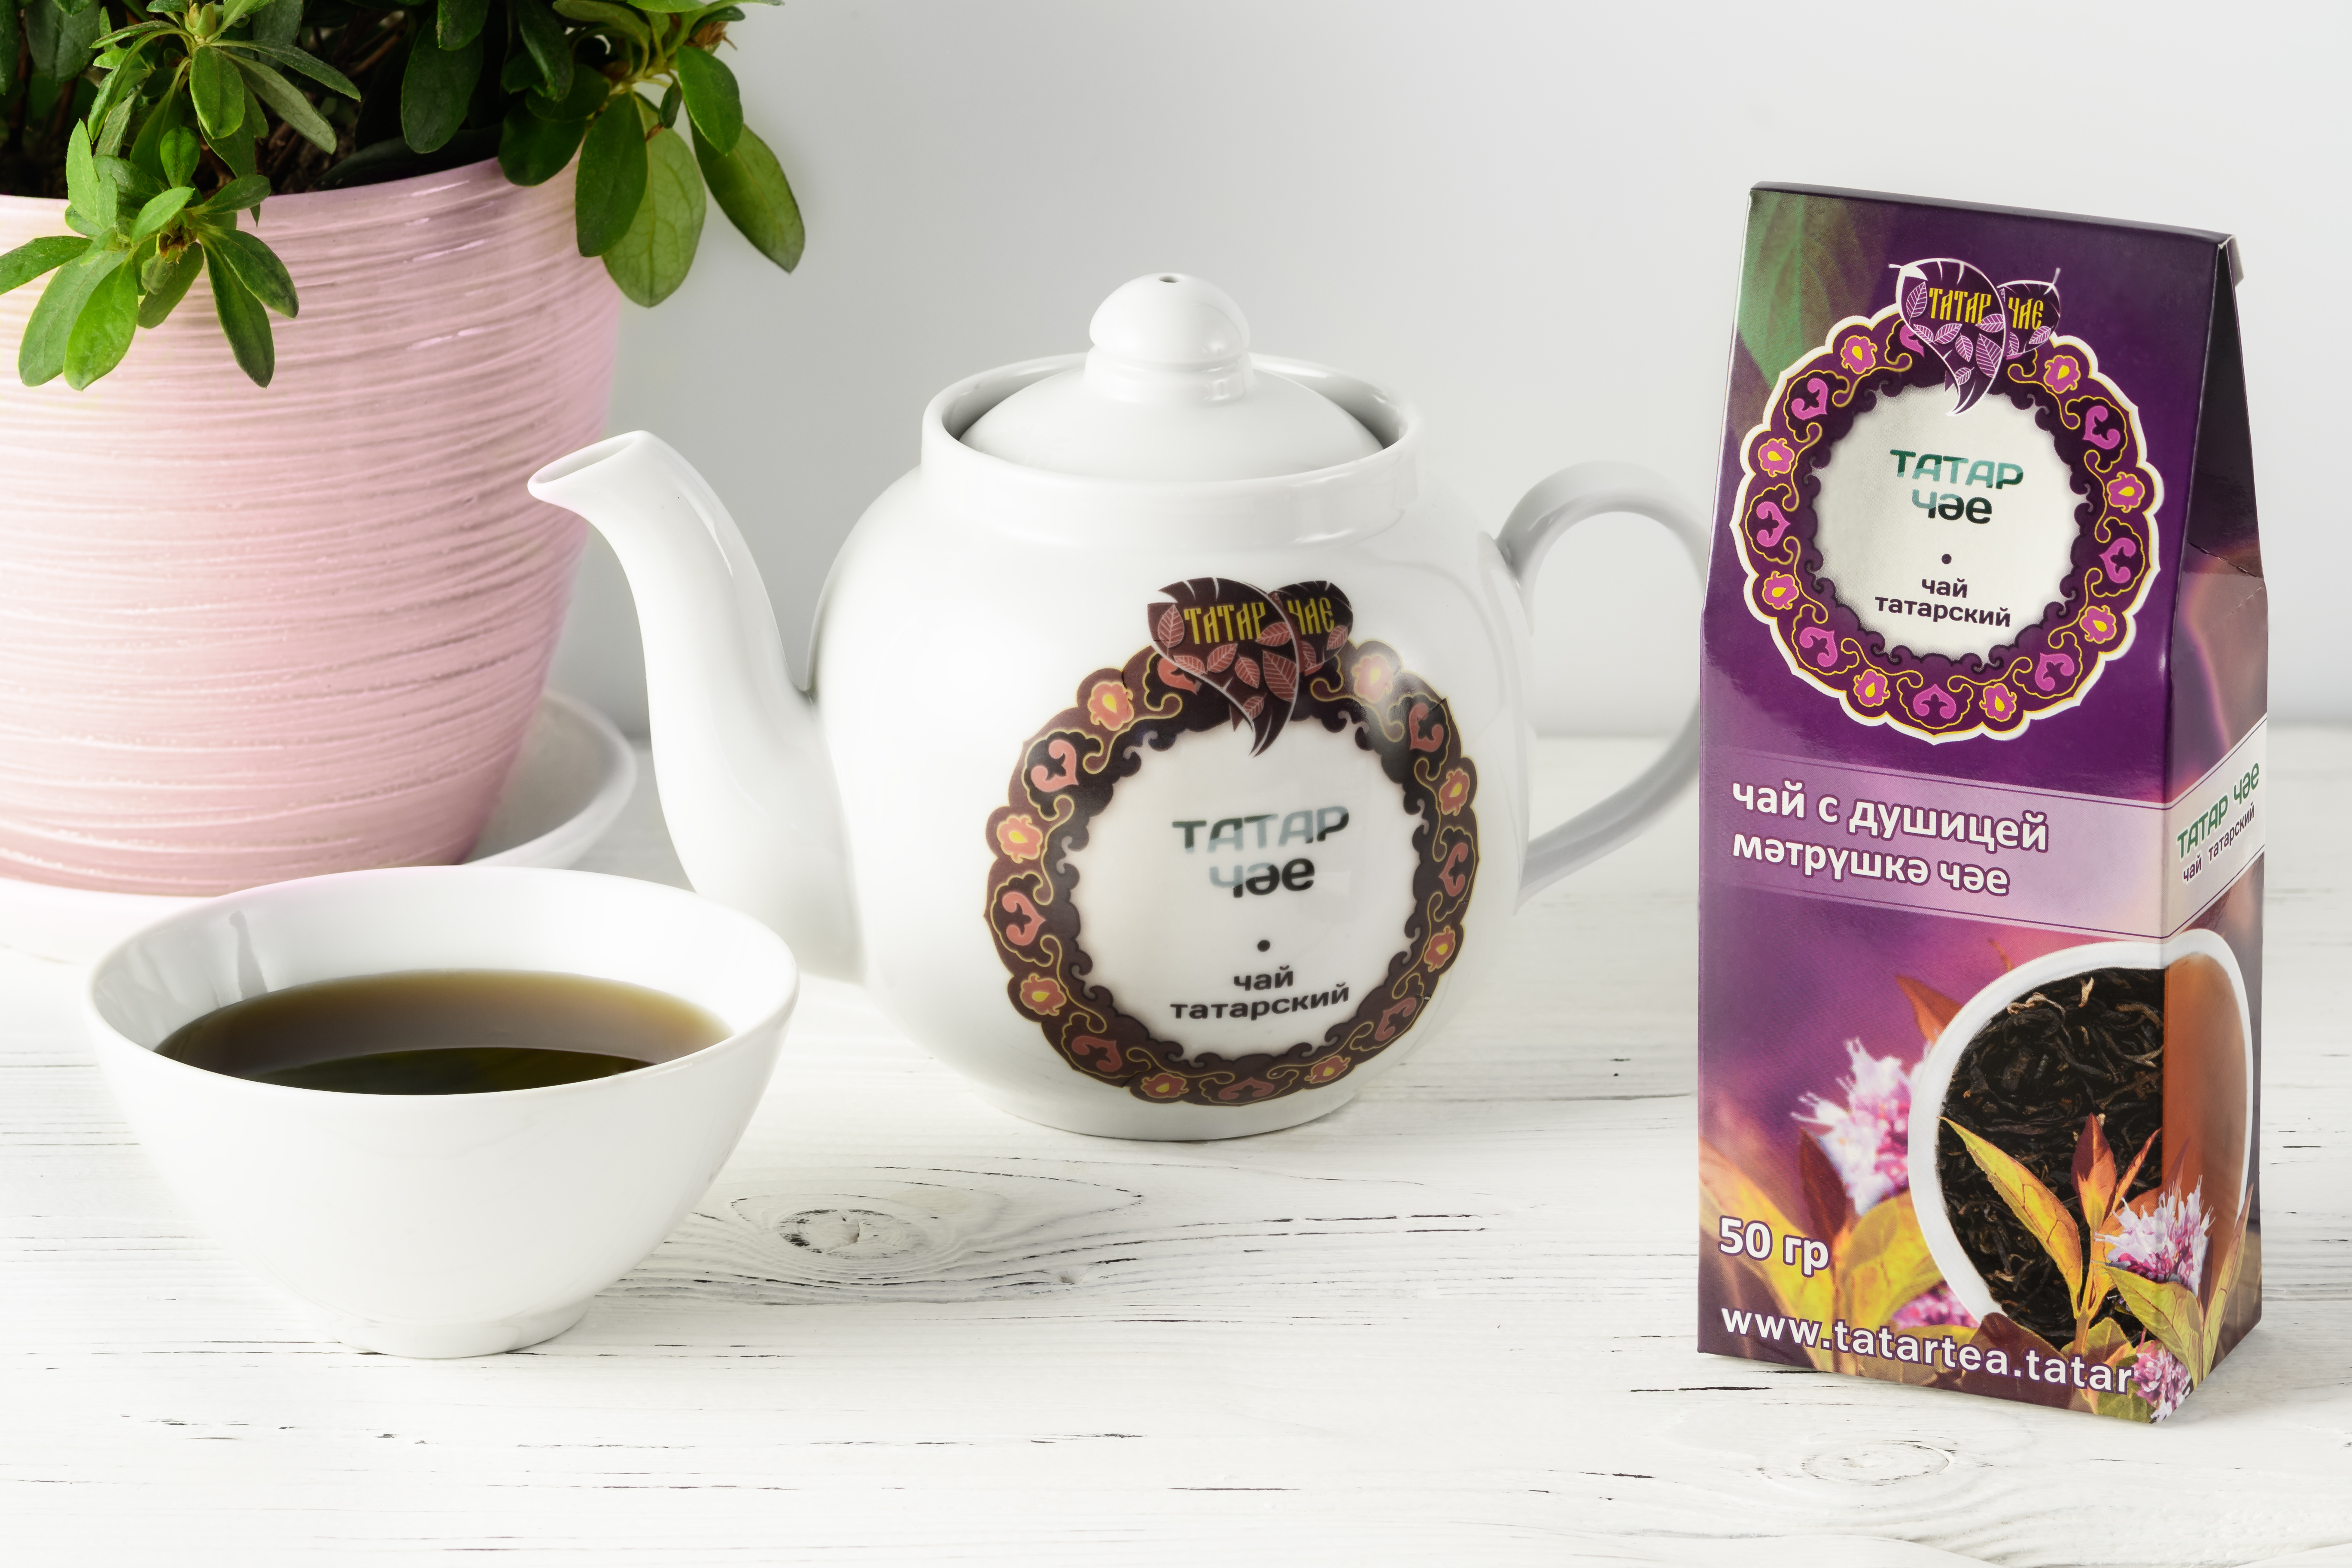 tea-композиция татар